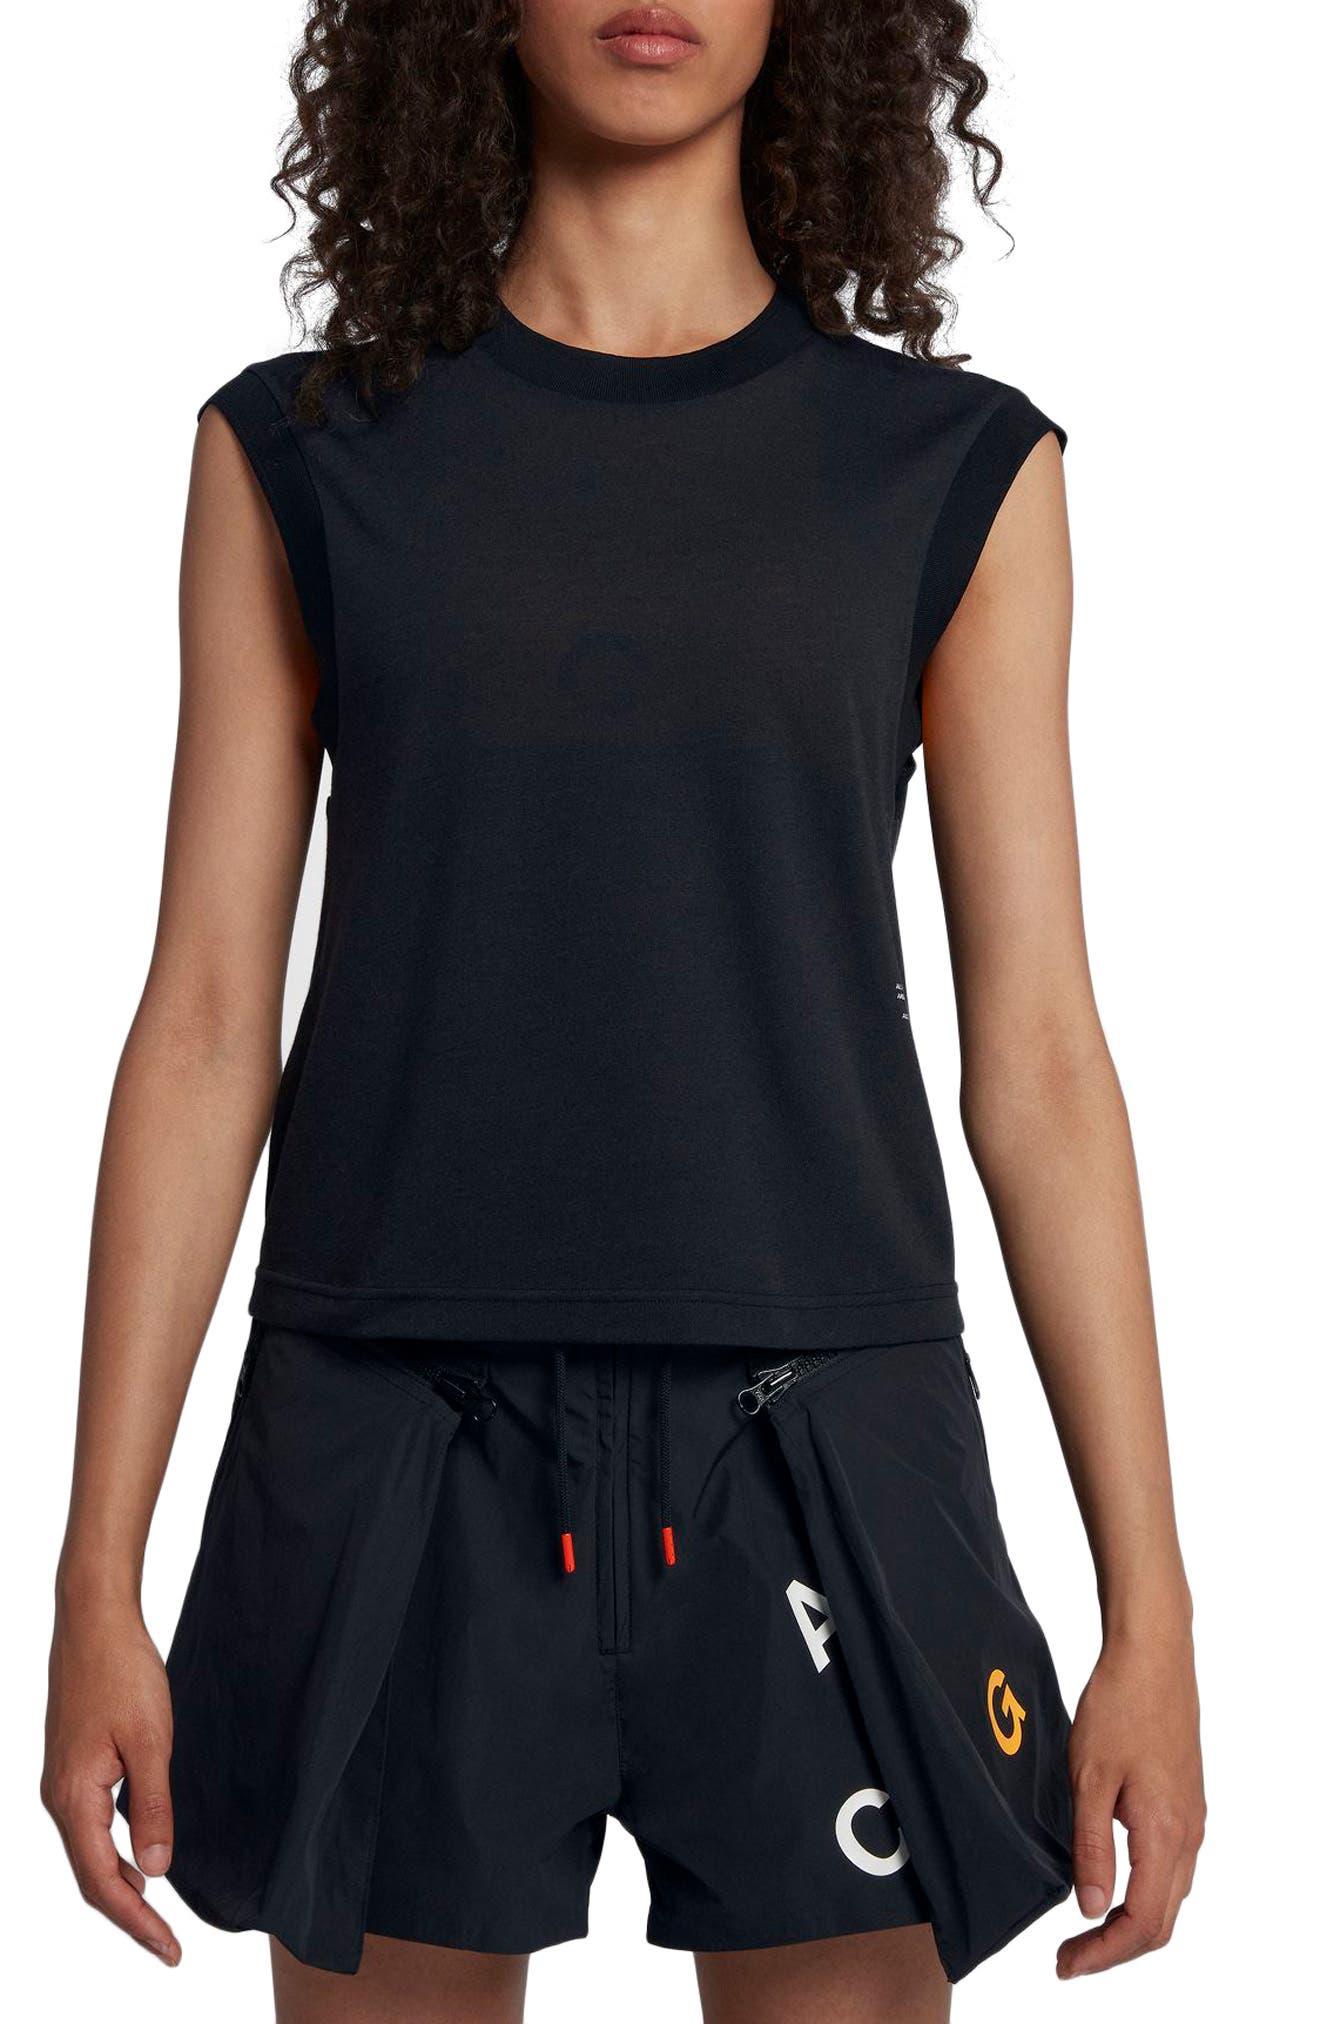 NIKE NikeLab ACG Women's Sleeveless Top, Main, color, 010